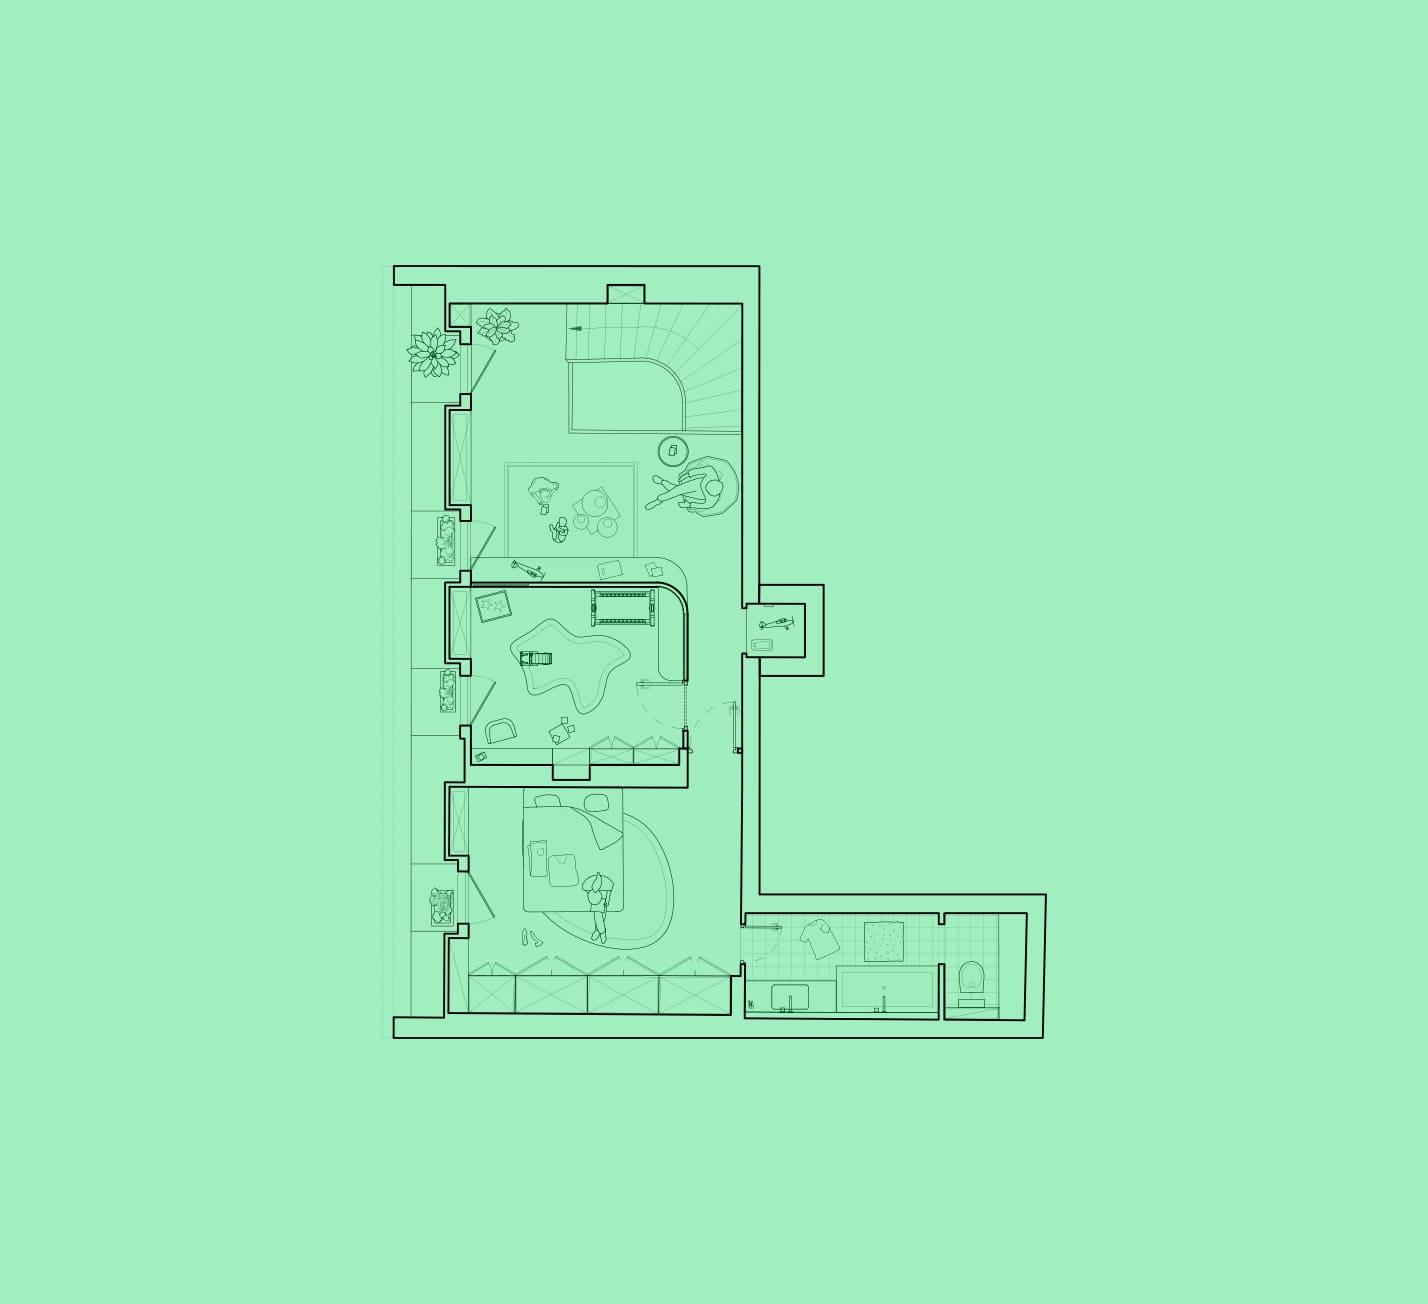 Projet-Arlequin-Atelier-Steve-Pauline-Borgia-Architecture-Plan-02-min